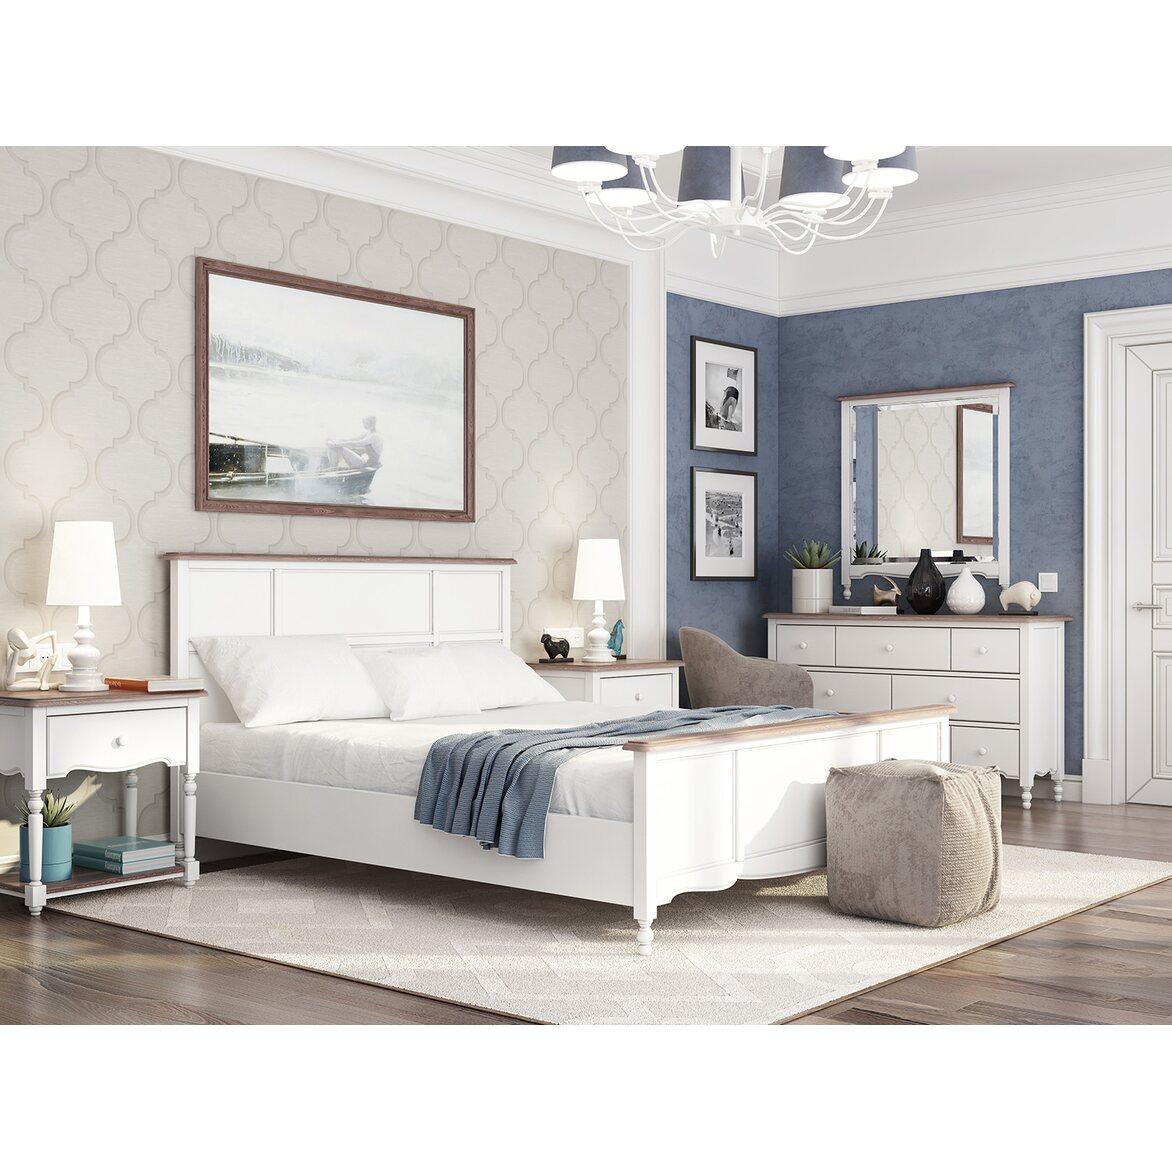 Кровать двуспальная 160*200 Leblanc, белая 3   Двуспальные кровати Kingsby